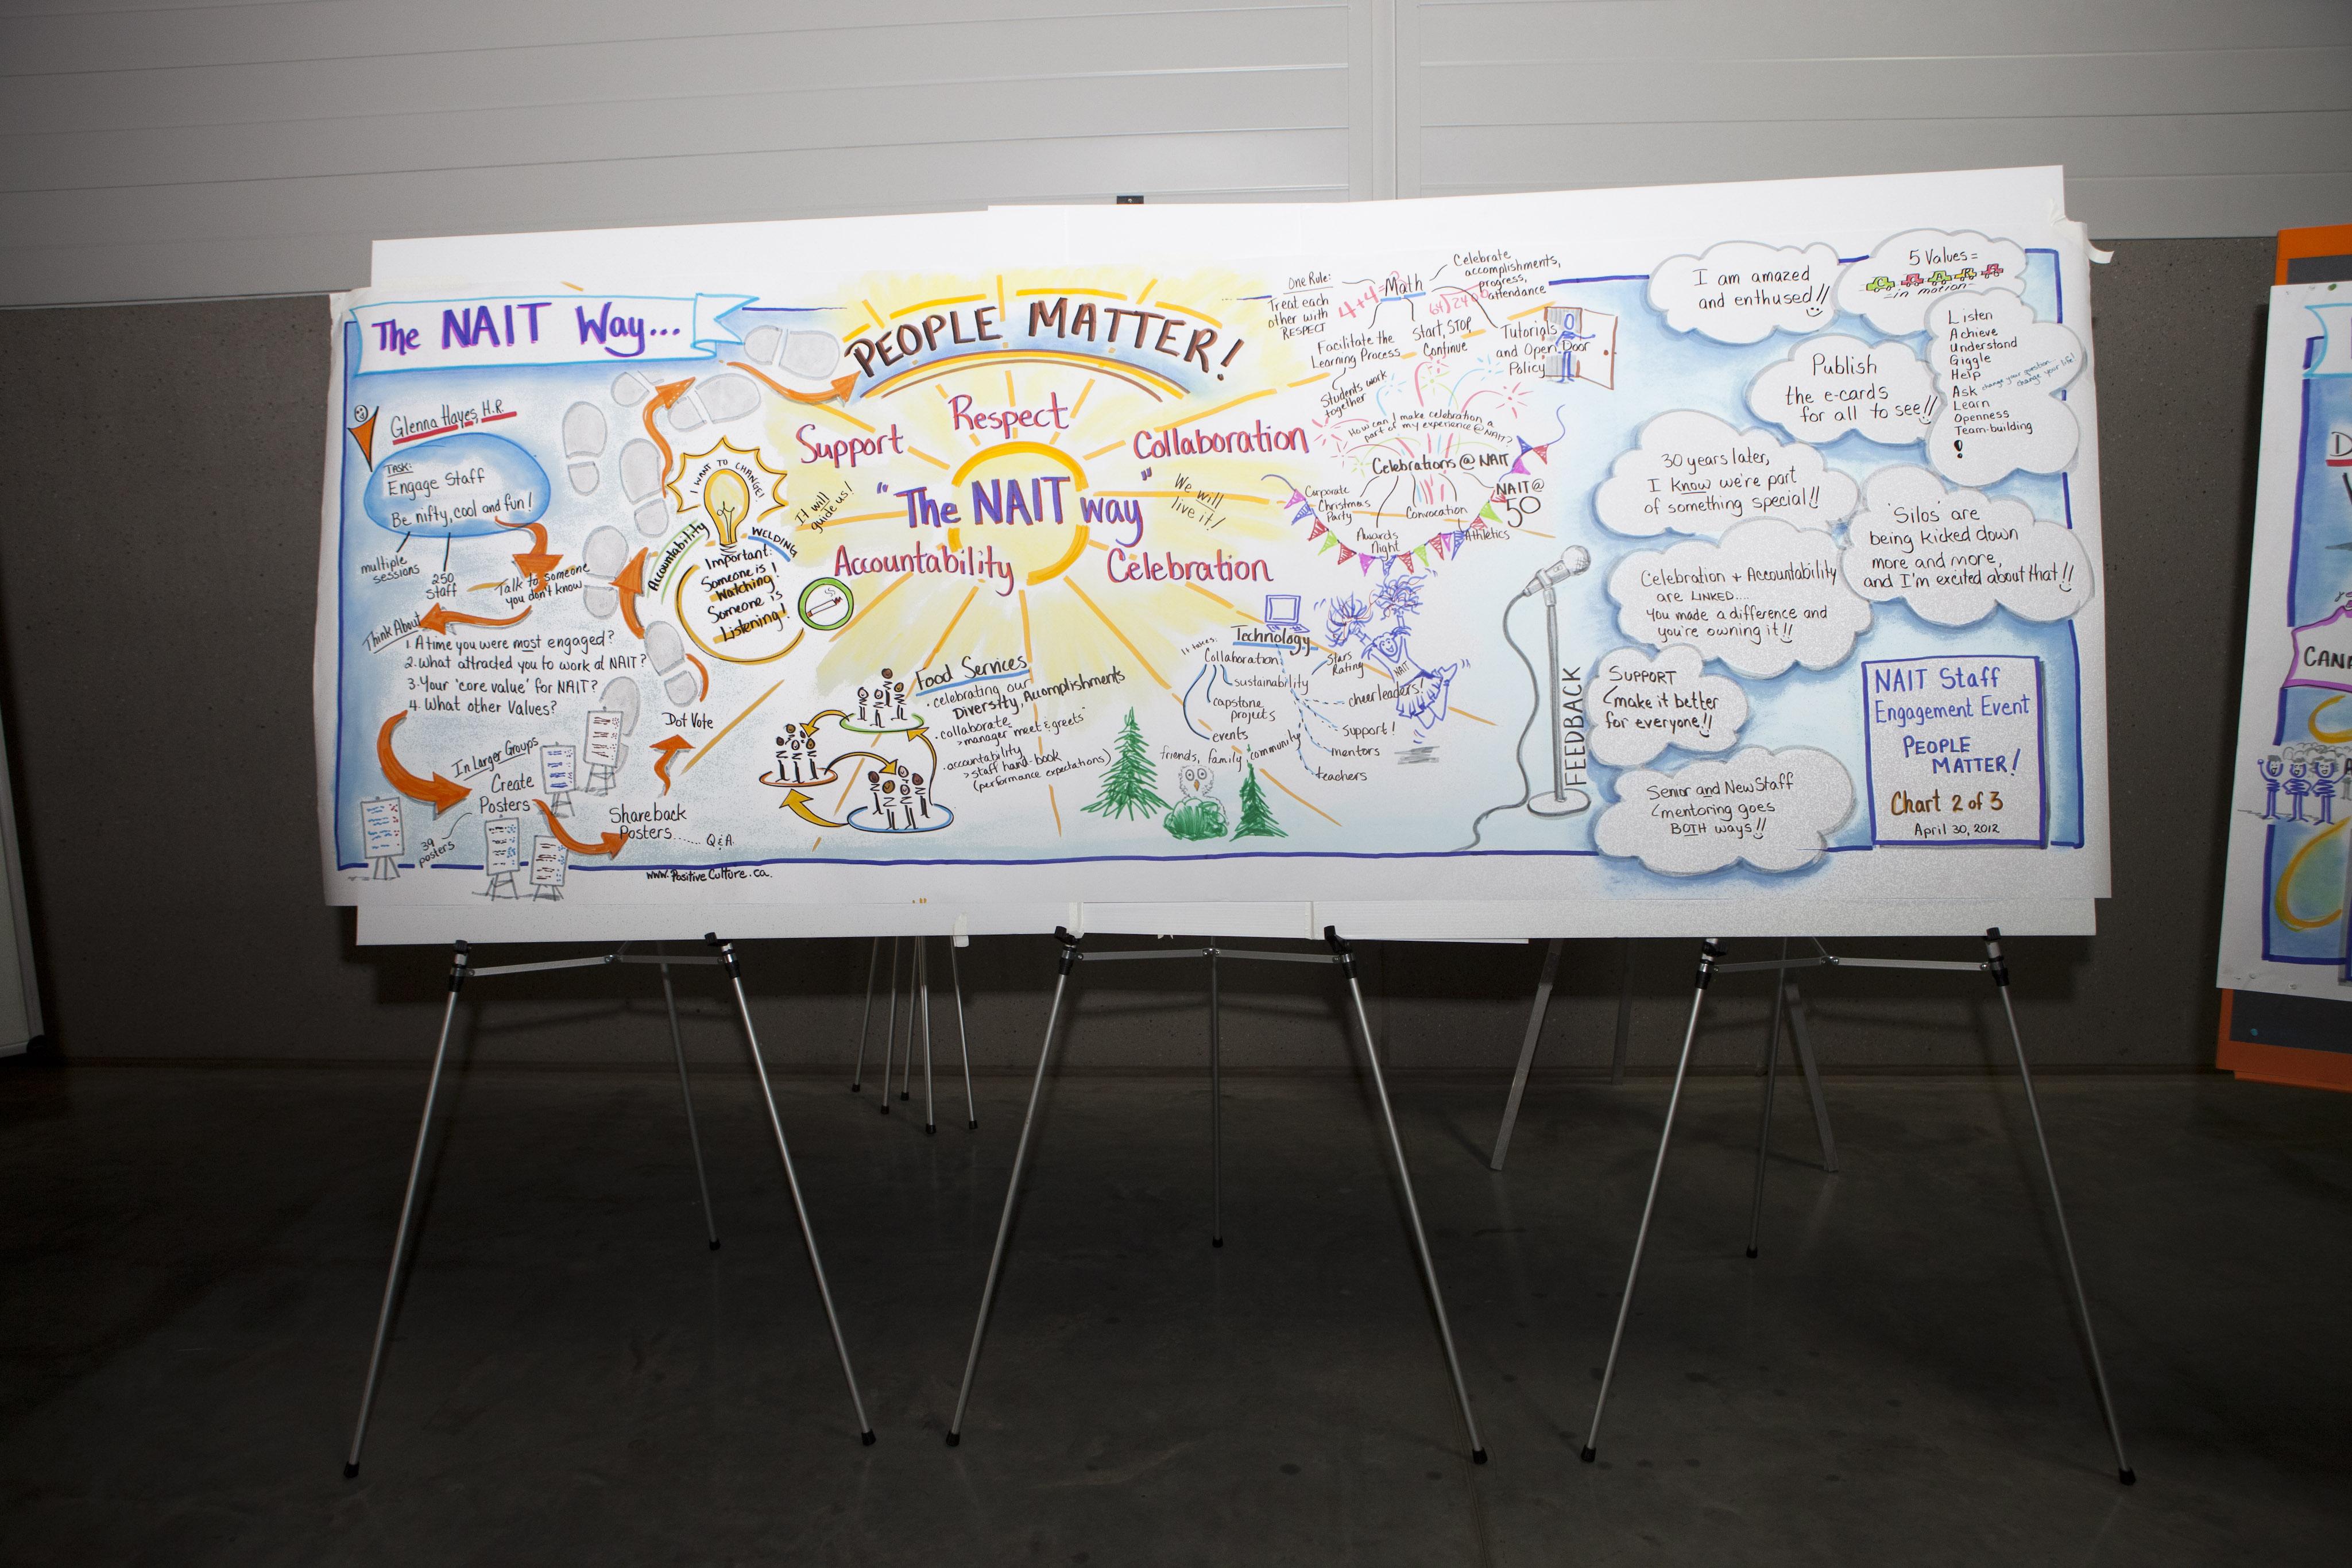 NAIT Staff Event; positive culture graphic recording